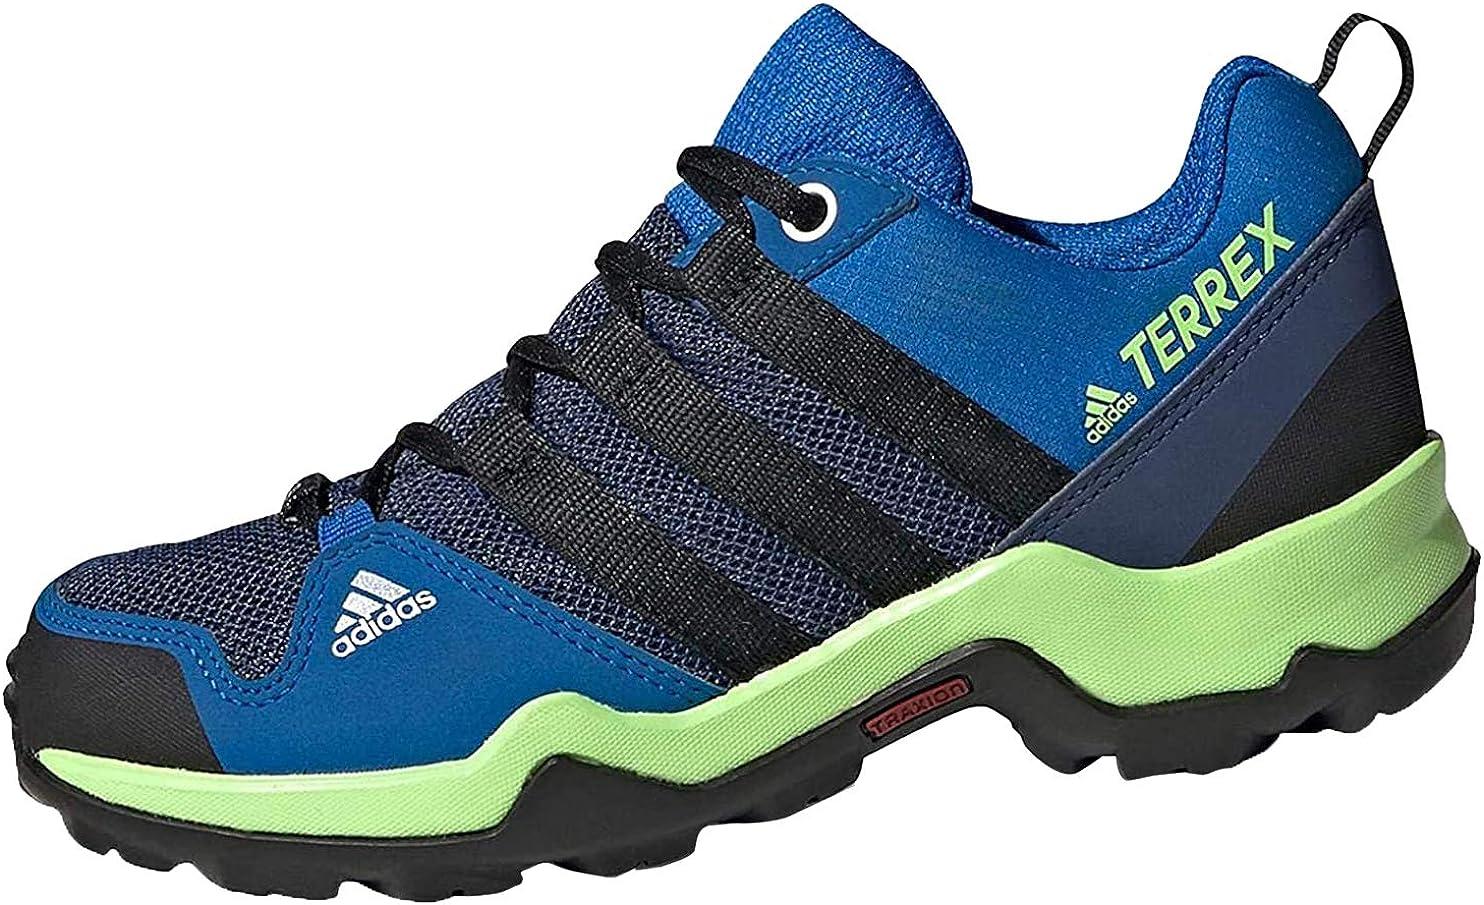 Discrepancia Ciudadanía Aumentar  Amazon.com   adidas Terrex AX2R CP Junior Walking Shoes - AW20   Shoes